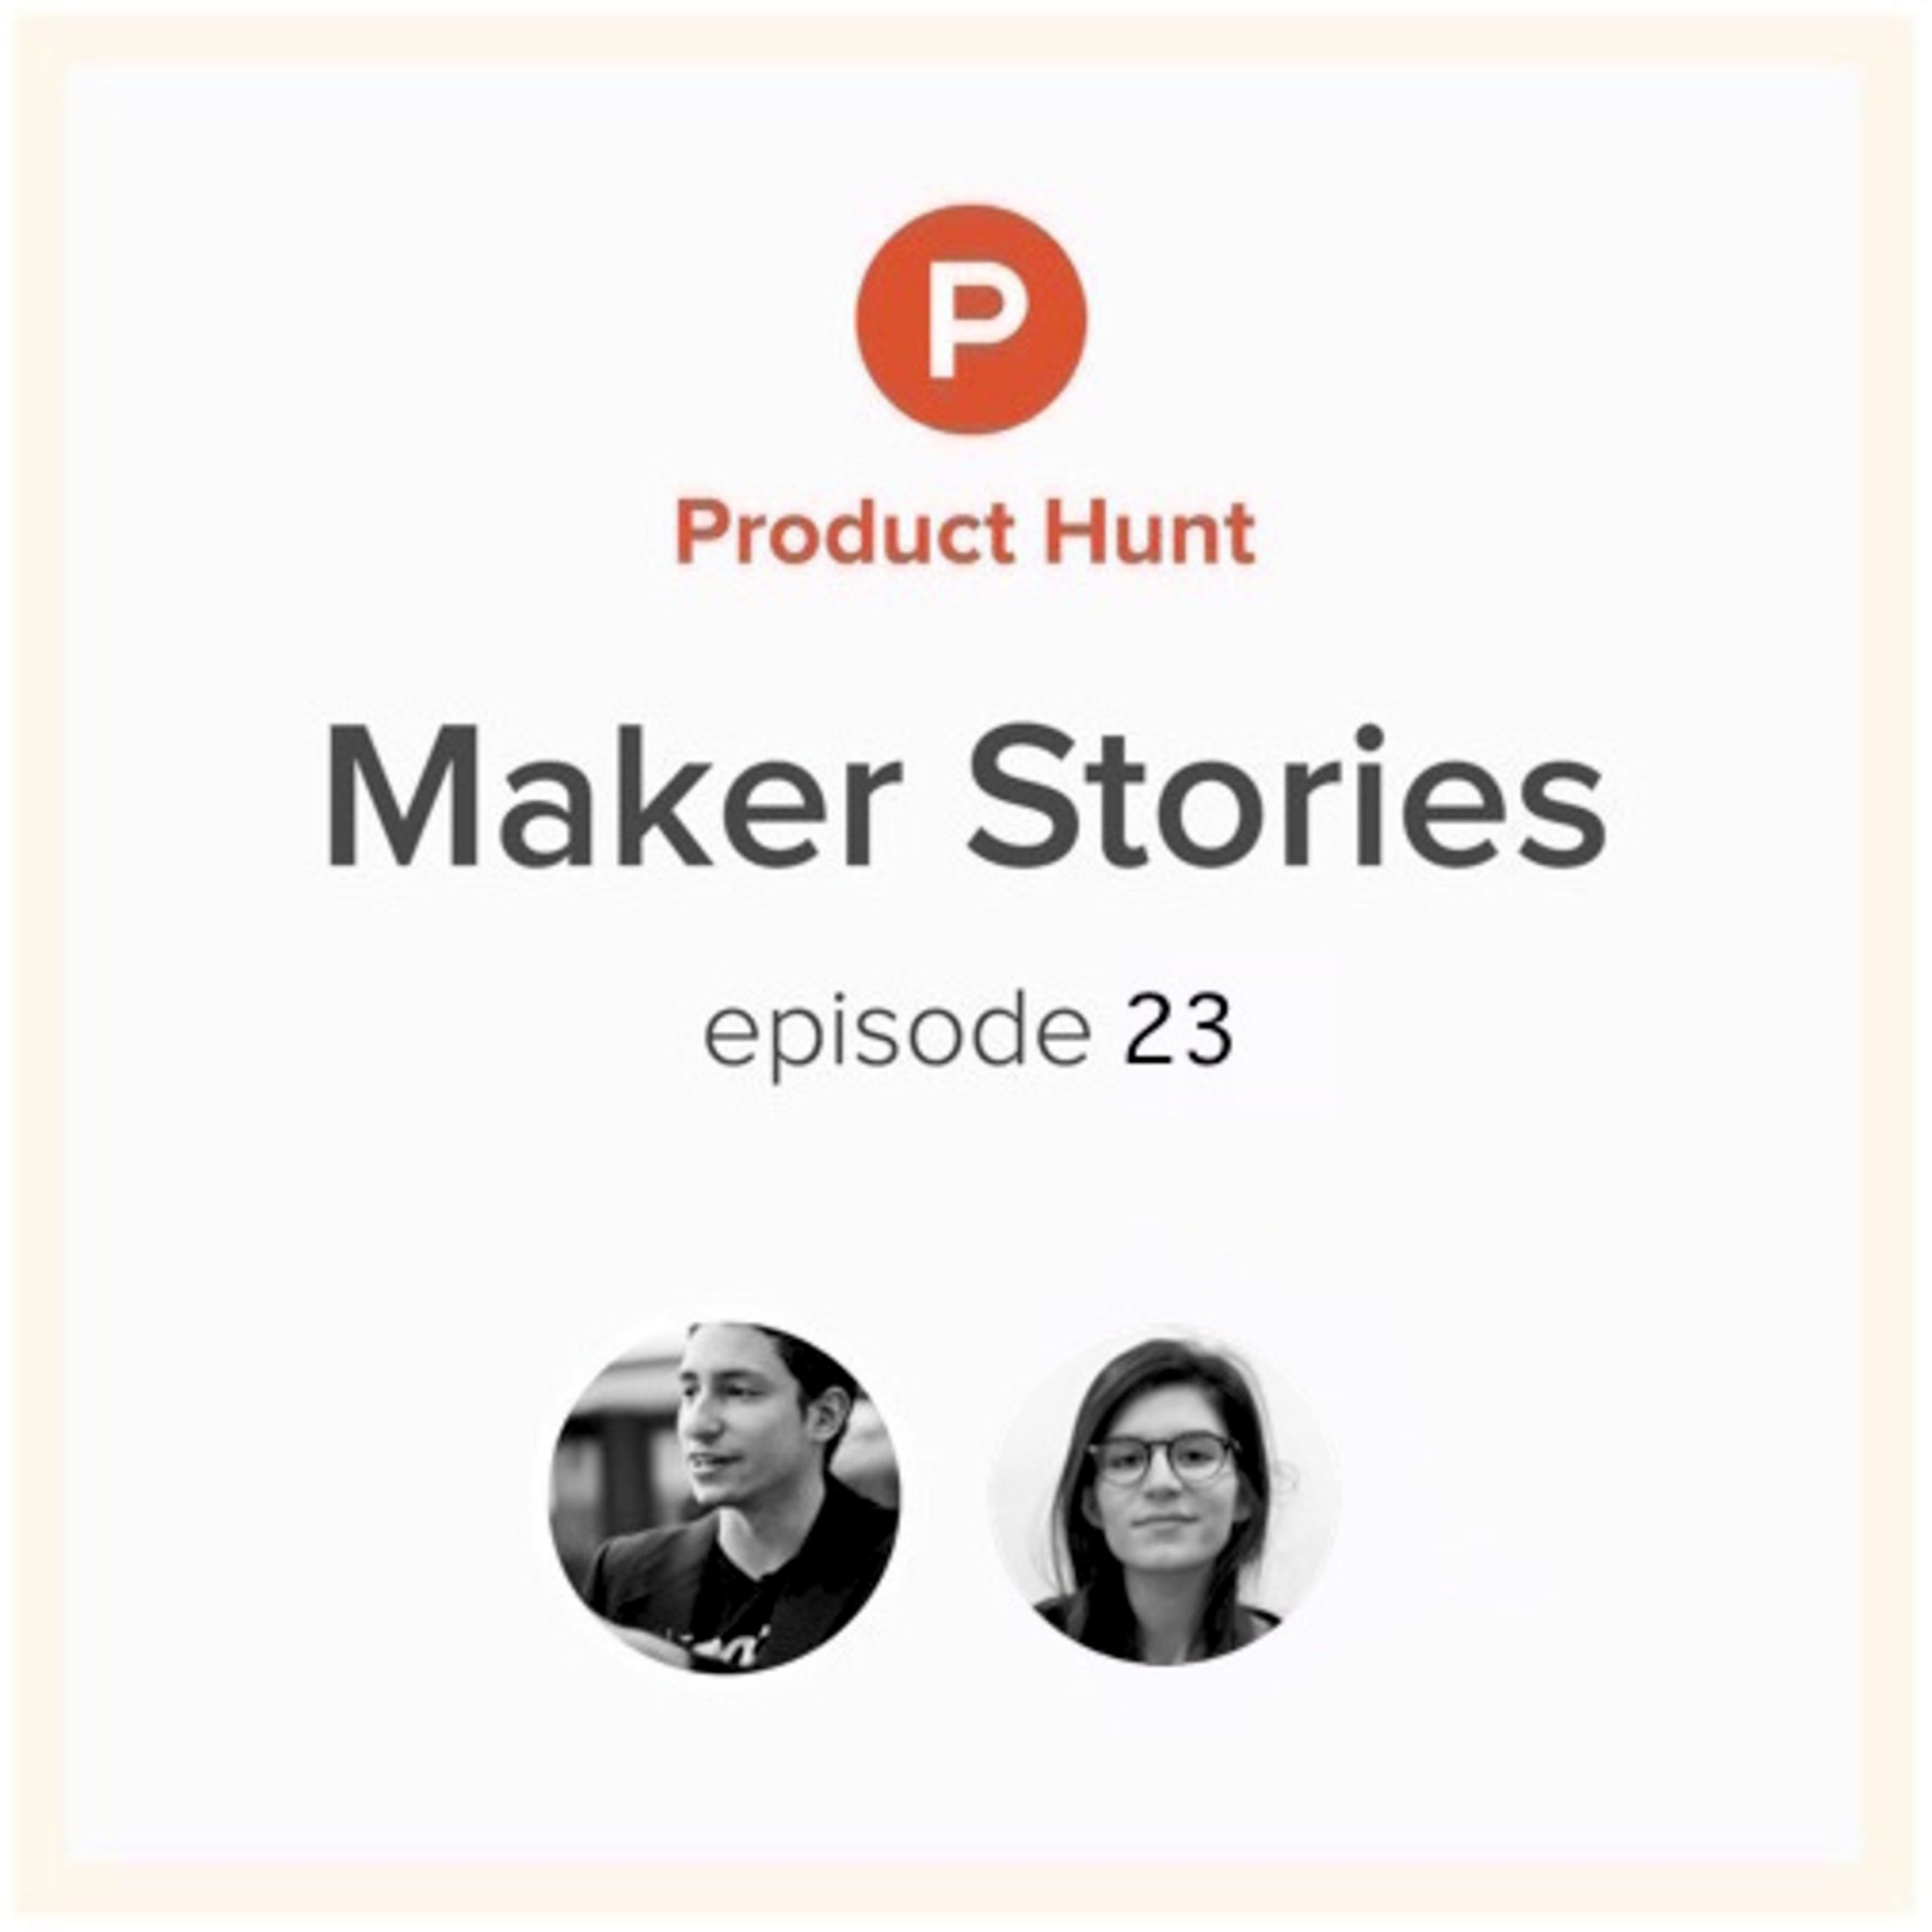 Maker Stories: Episode 23 w/ Dayna Tortorici